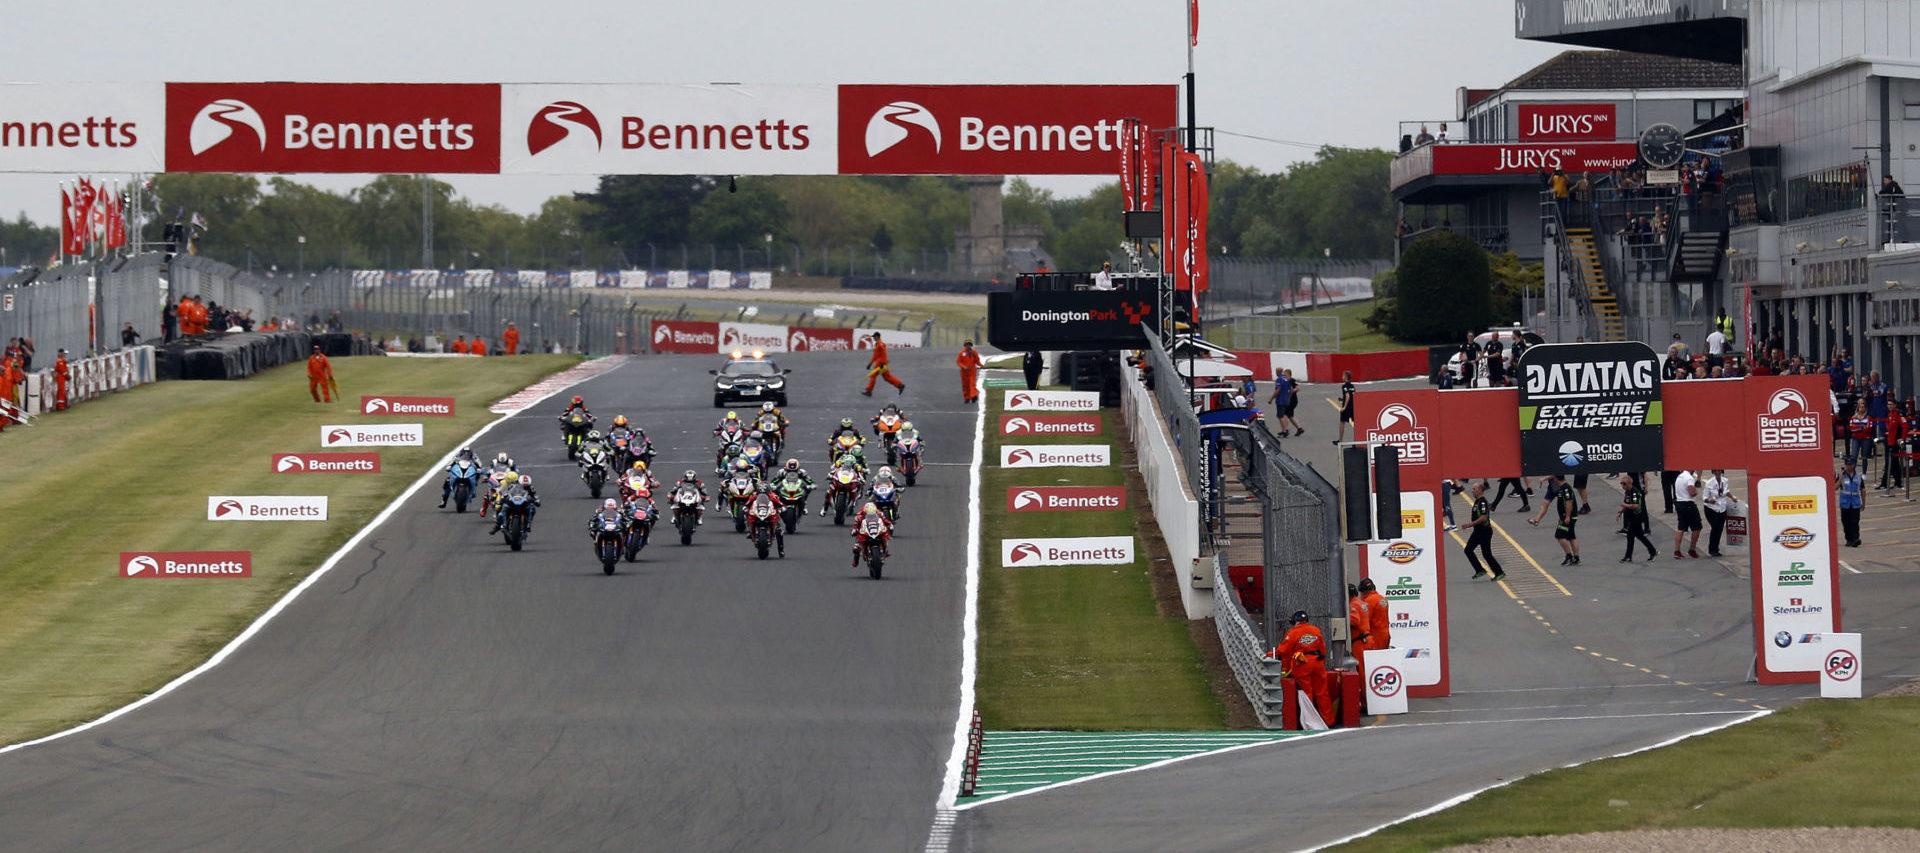 The start of a British Superbike race at Donington Park. Photo courtesy of MotorSport Vision Racing.